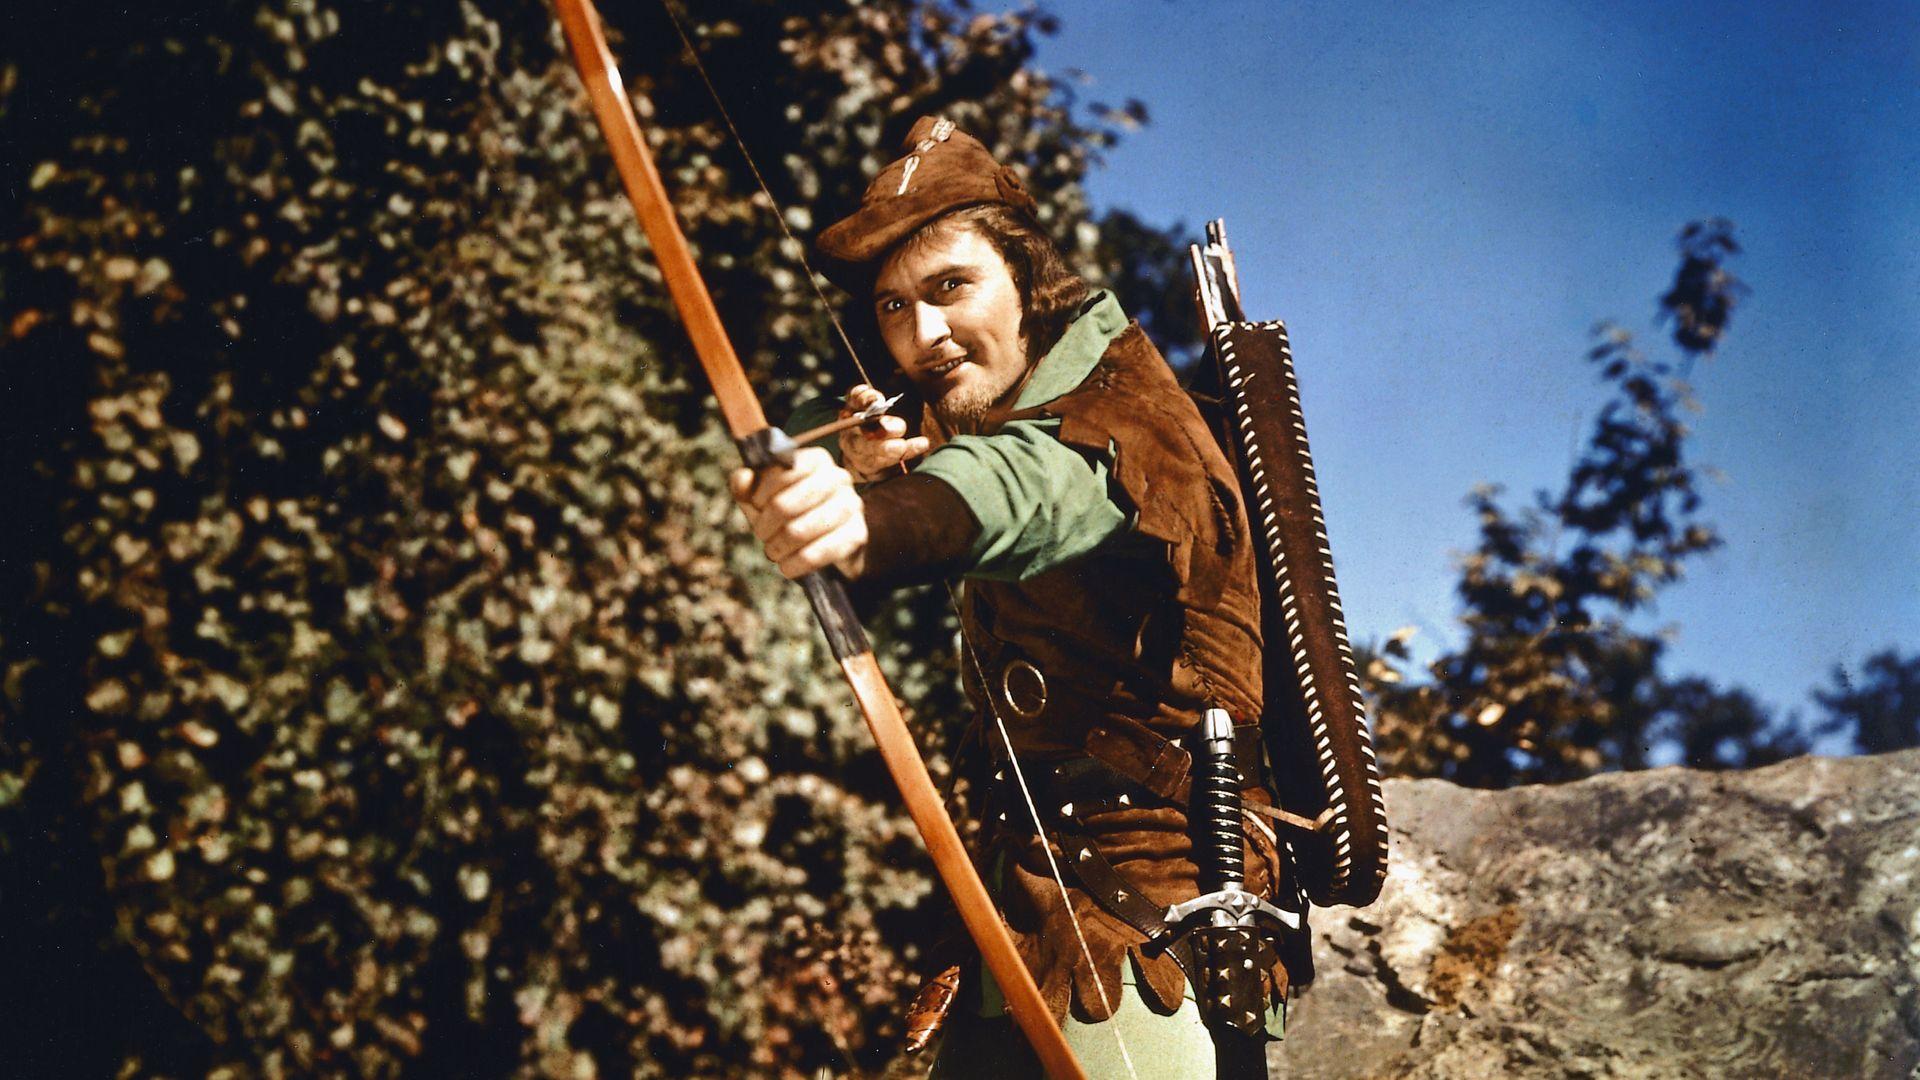 FREE SPIRIT: Errol Flynn in the 1938 film The Adventures of Robin Hood - Credit: Getty Images